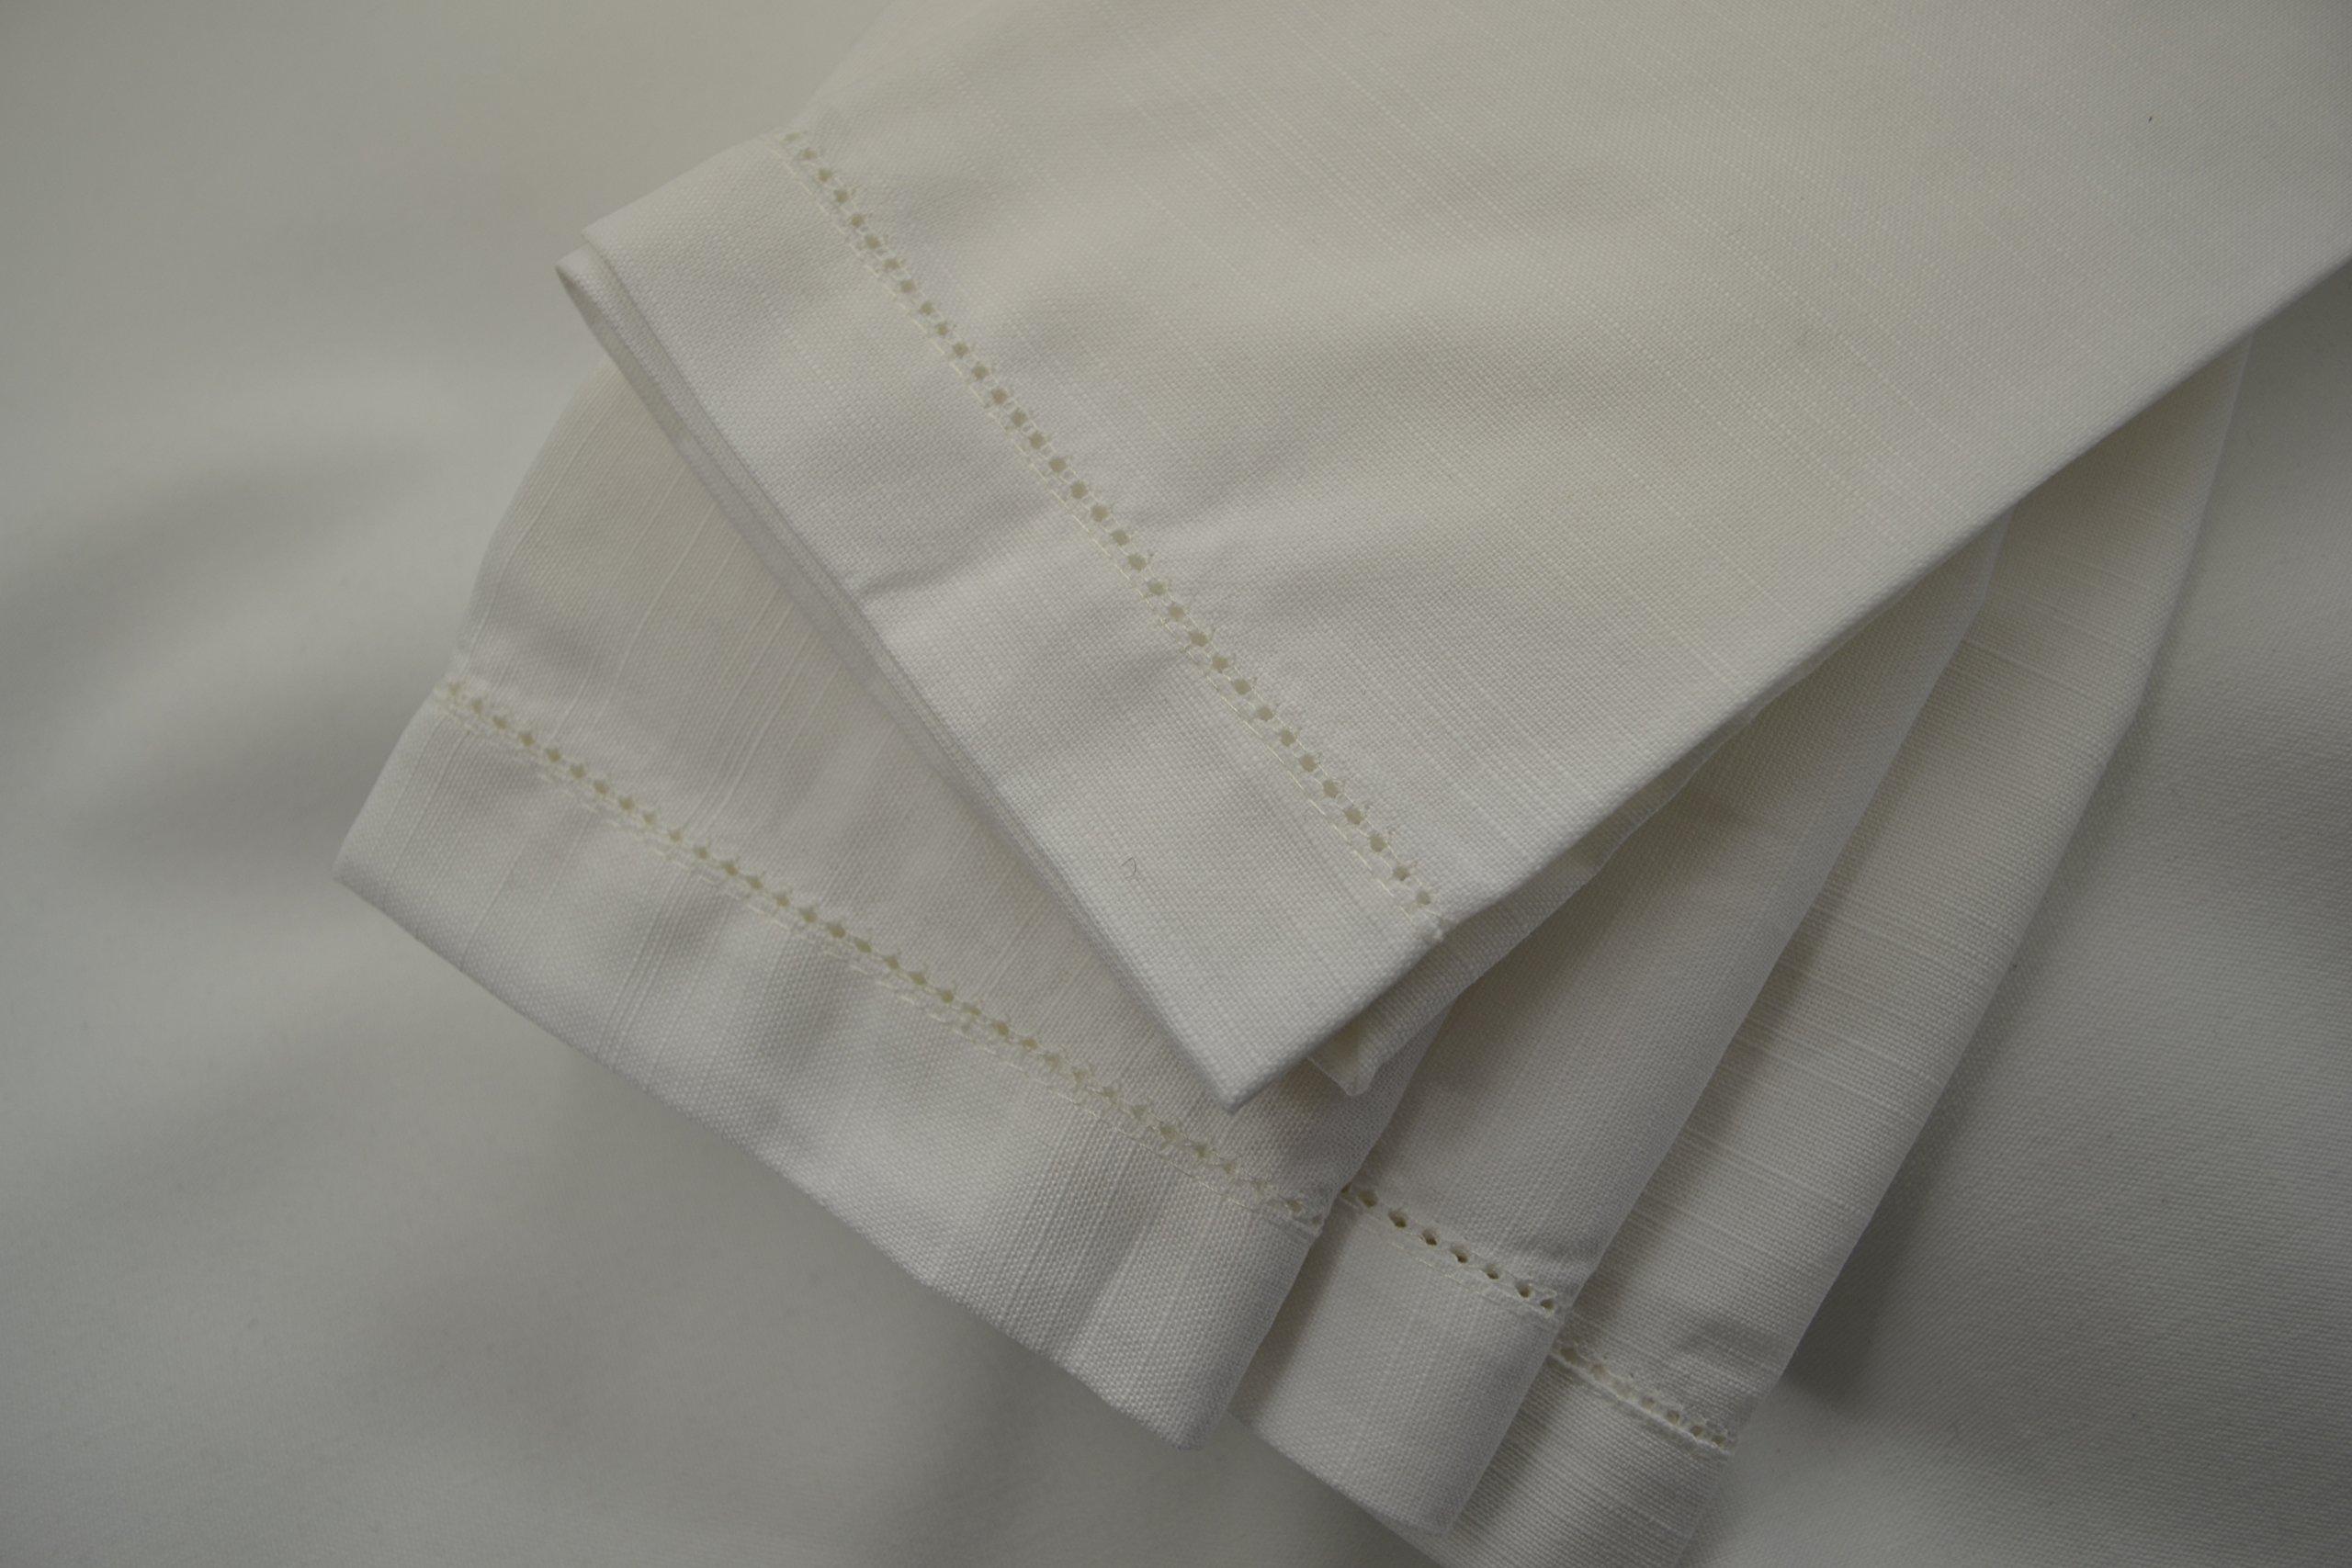 Hemstitch Dinner Napkins White 1 Dozen by Something Different Linen by Something Different Linen (Image #7)